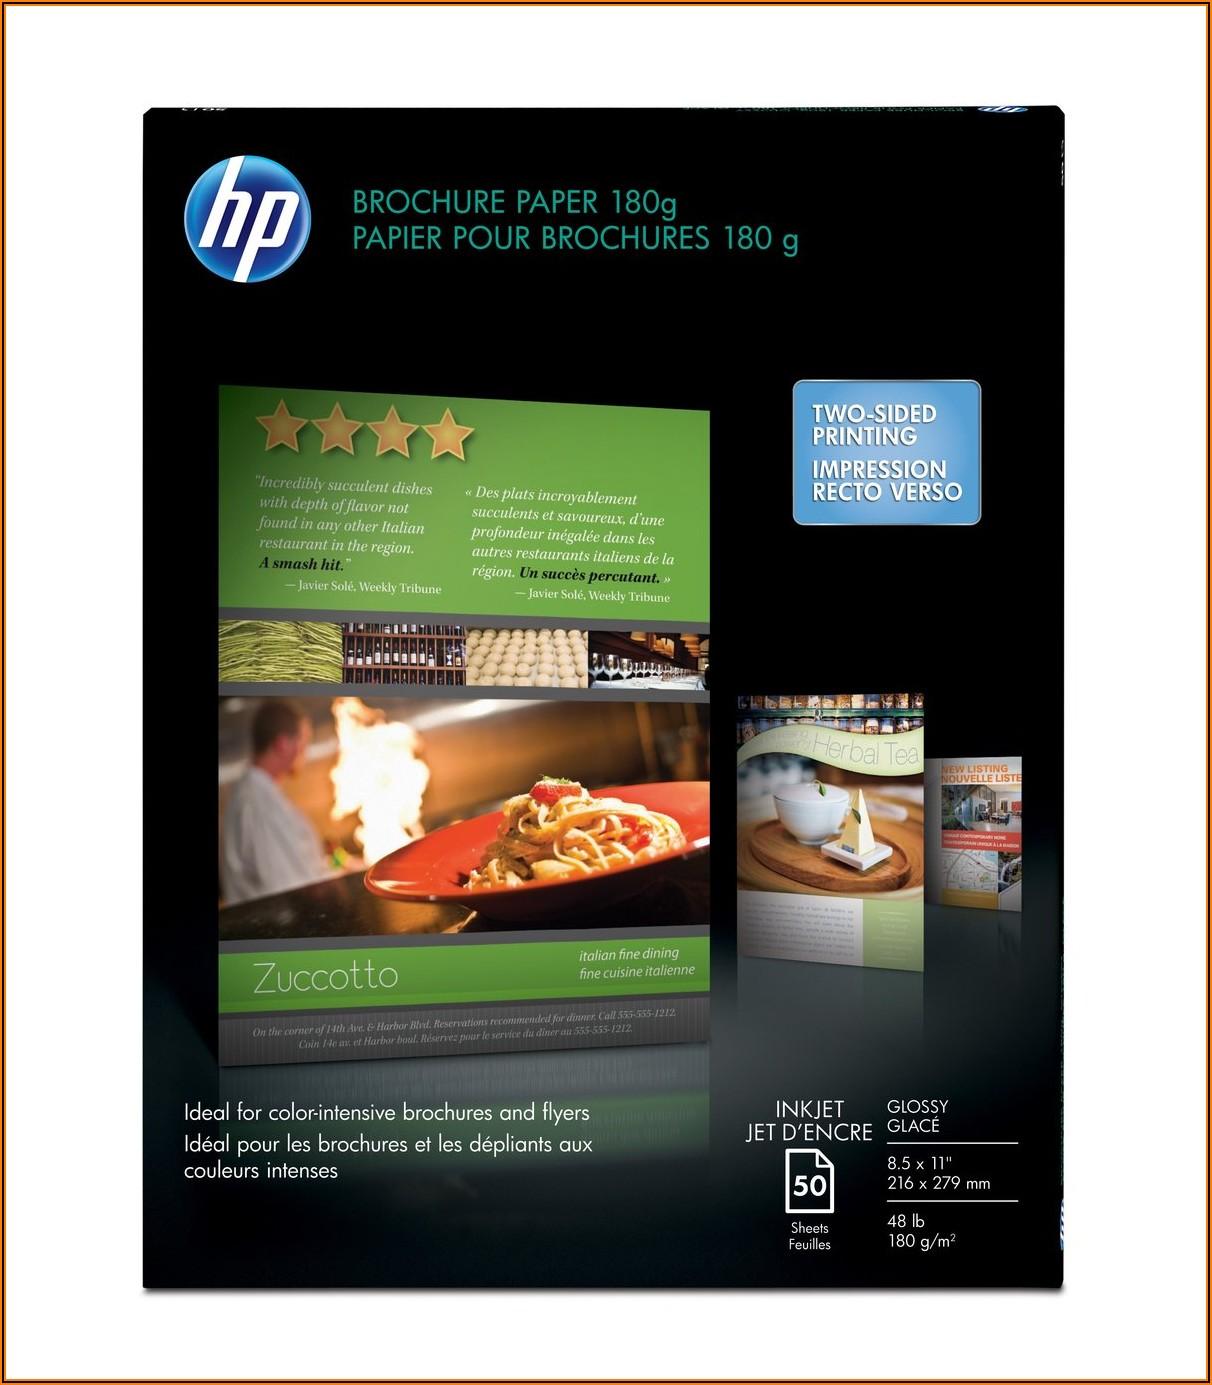 Hp Brochure Paper 180g Glossy 150 Sheets